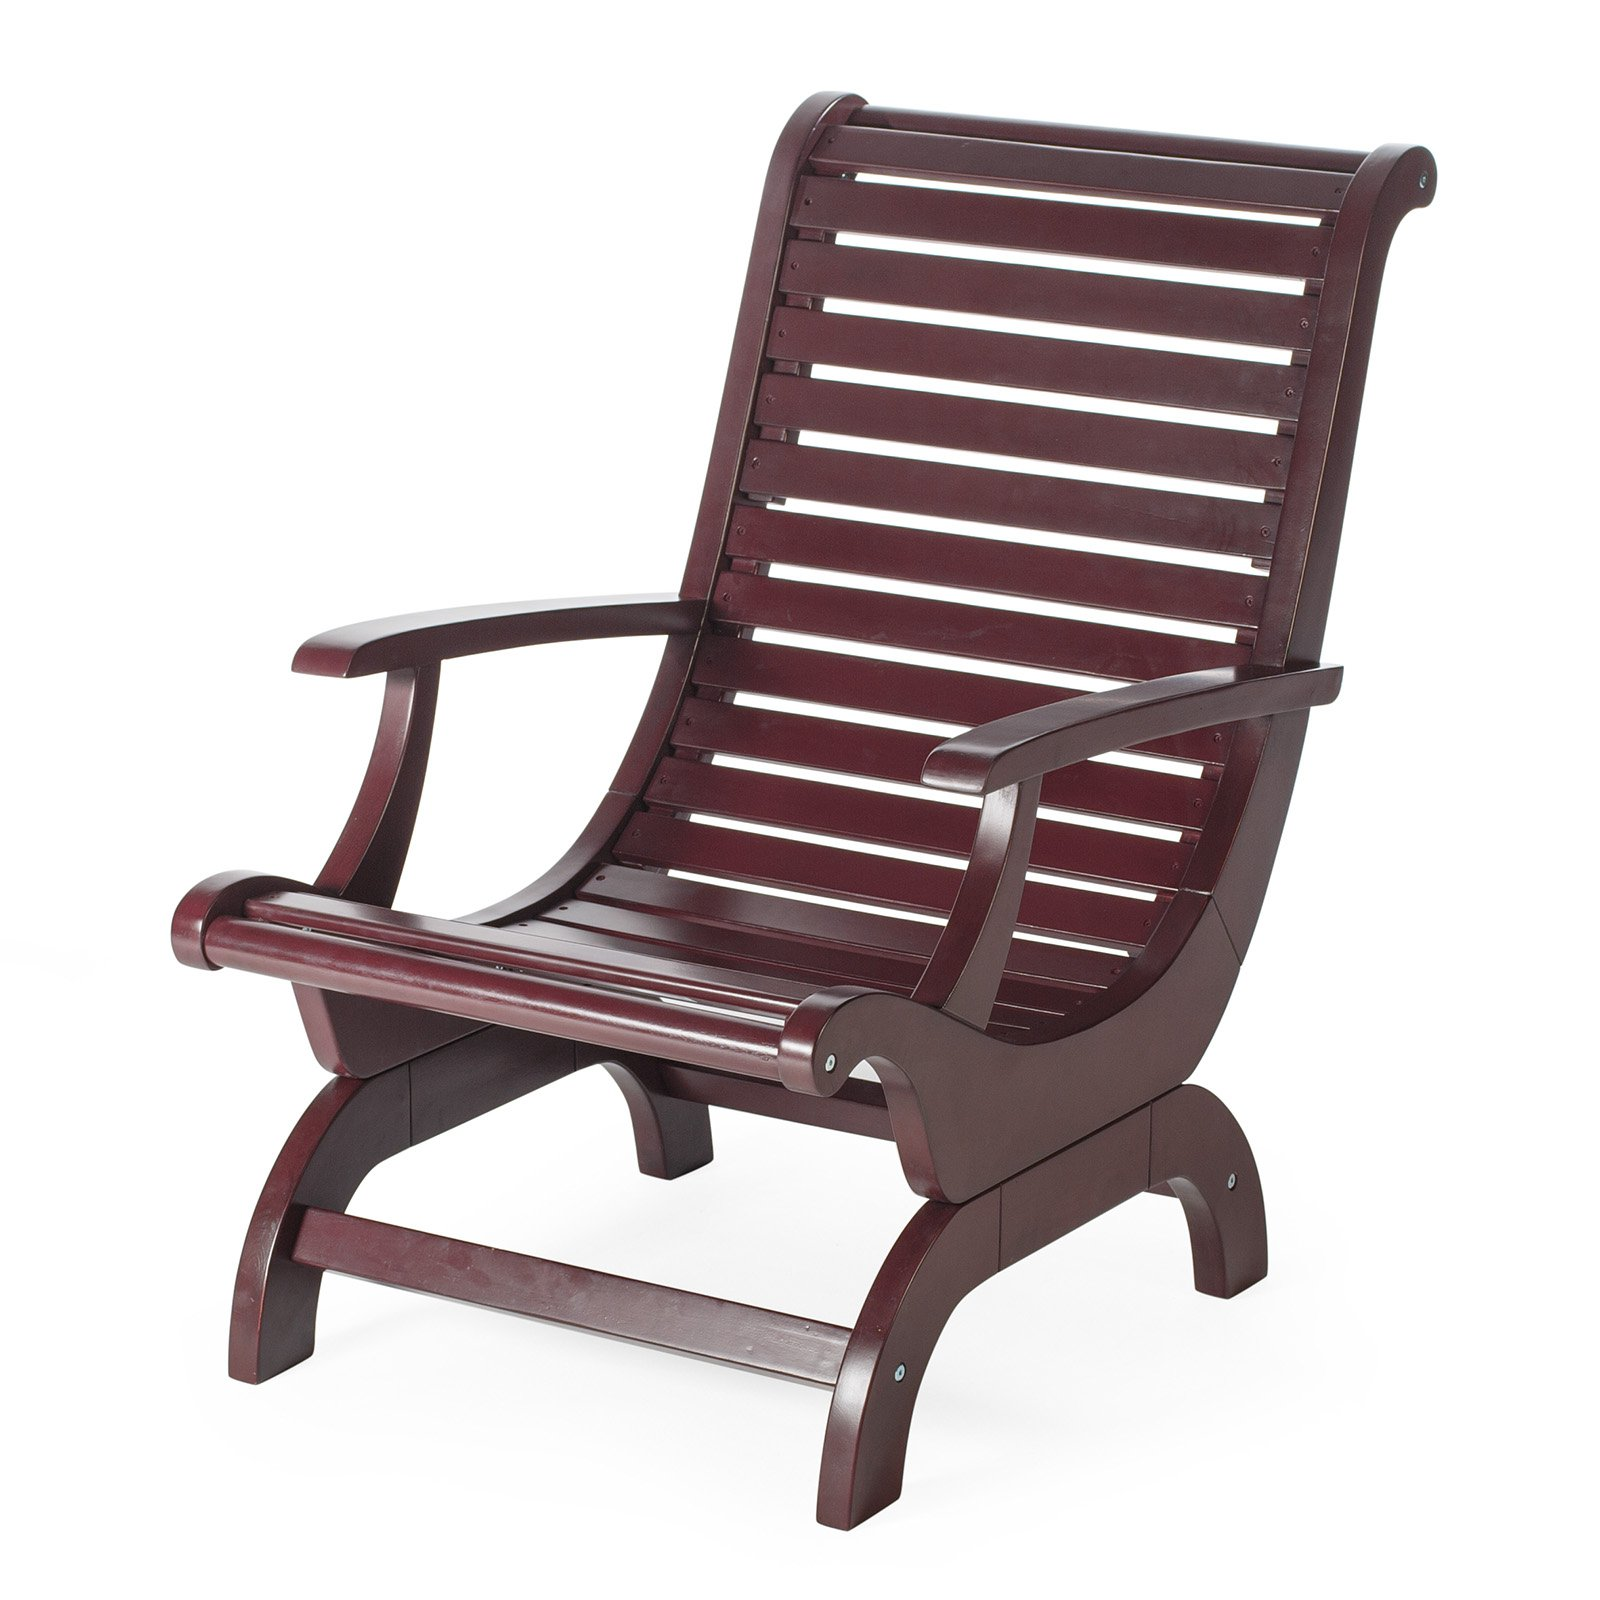 Belham Living Avondale Adirondack Chair